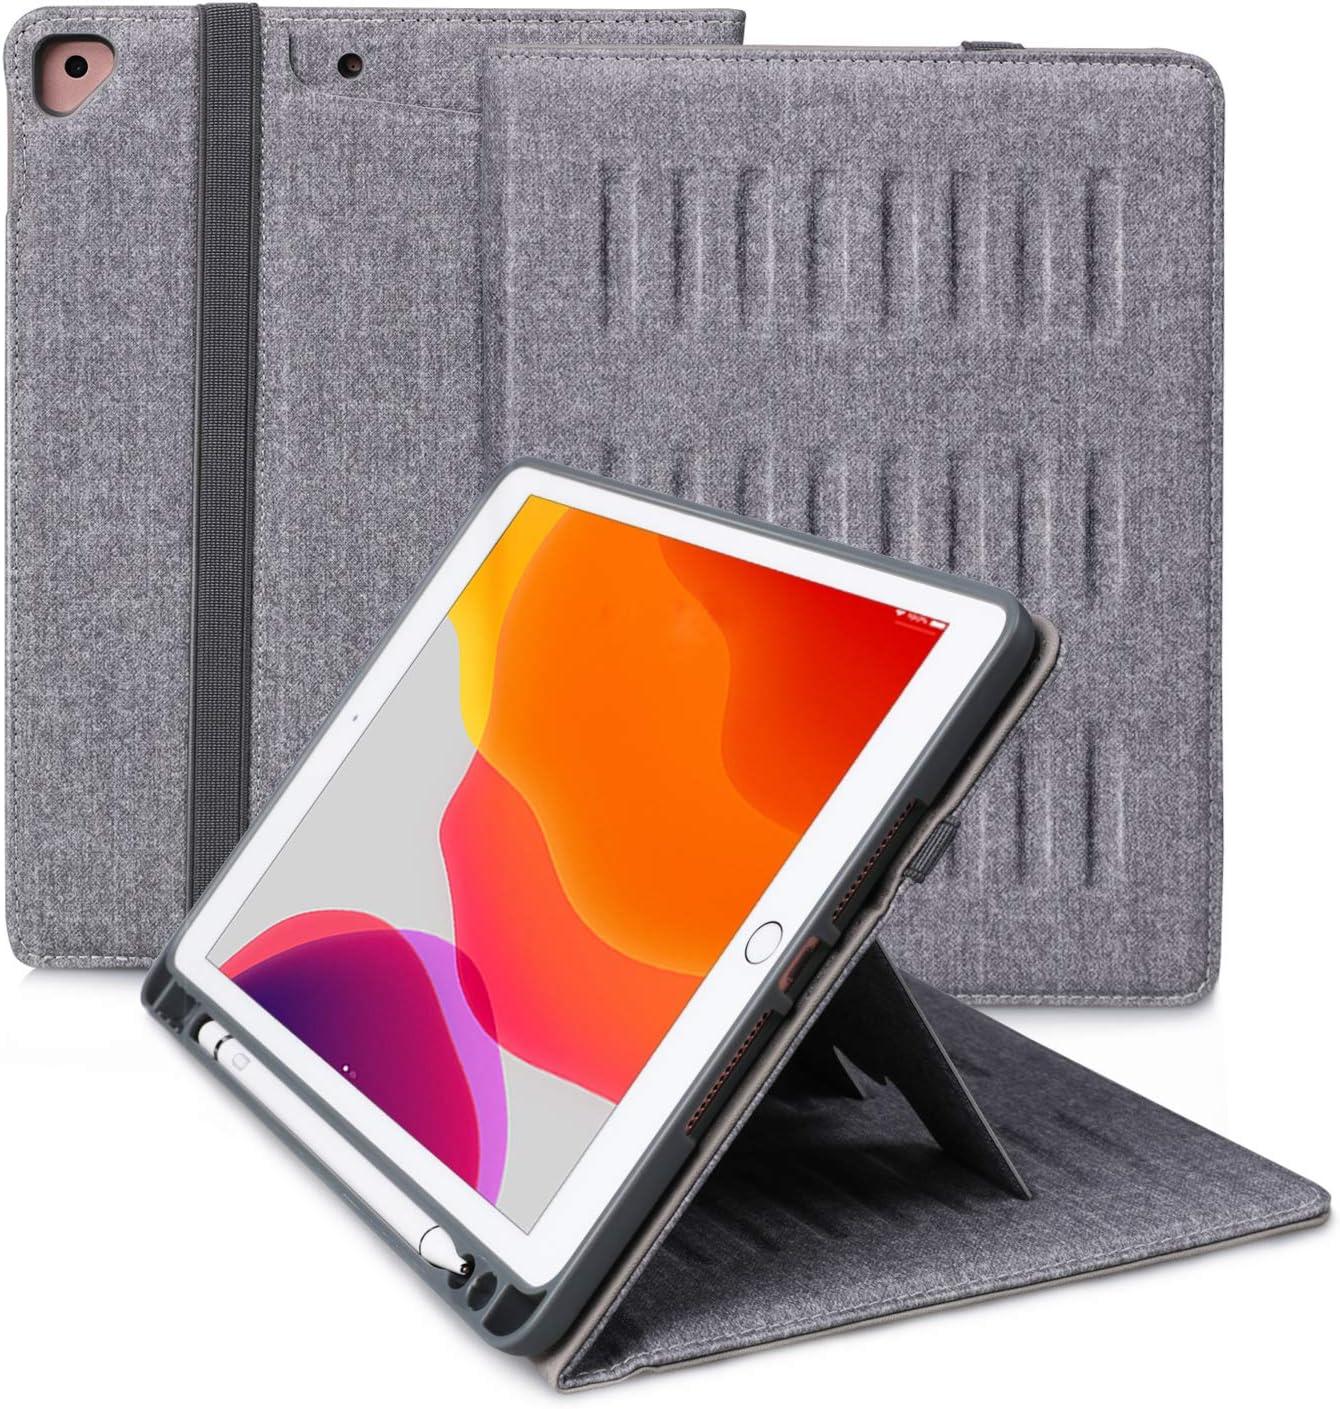 E NET-CASE iPad 10.2 Case,2020 iPad 8th Generation Case/2019 iPad 7th Generation Case,Multi-Viewing Angles, iPad Air 3 10.5 inch Soft TPU Back Cover with Pencil Holder,Auto Wake/Sleep(Silver-2)